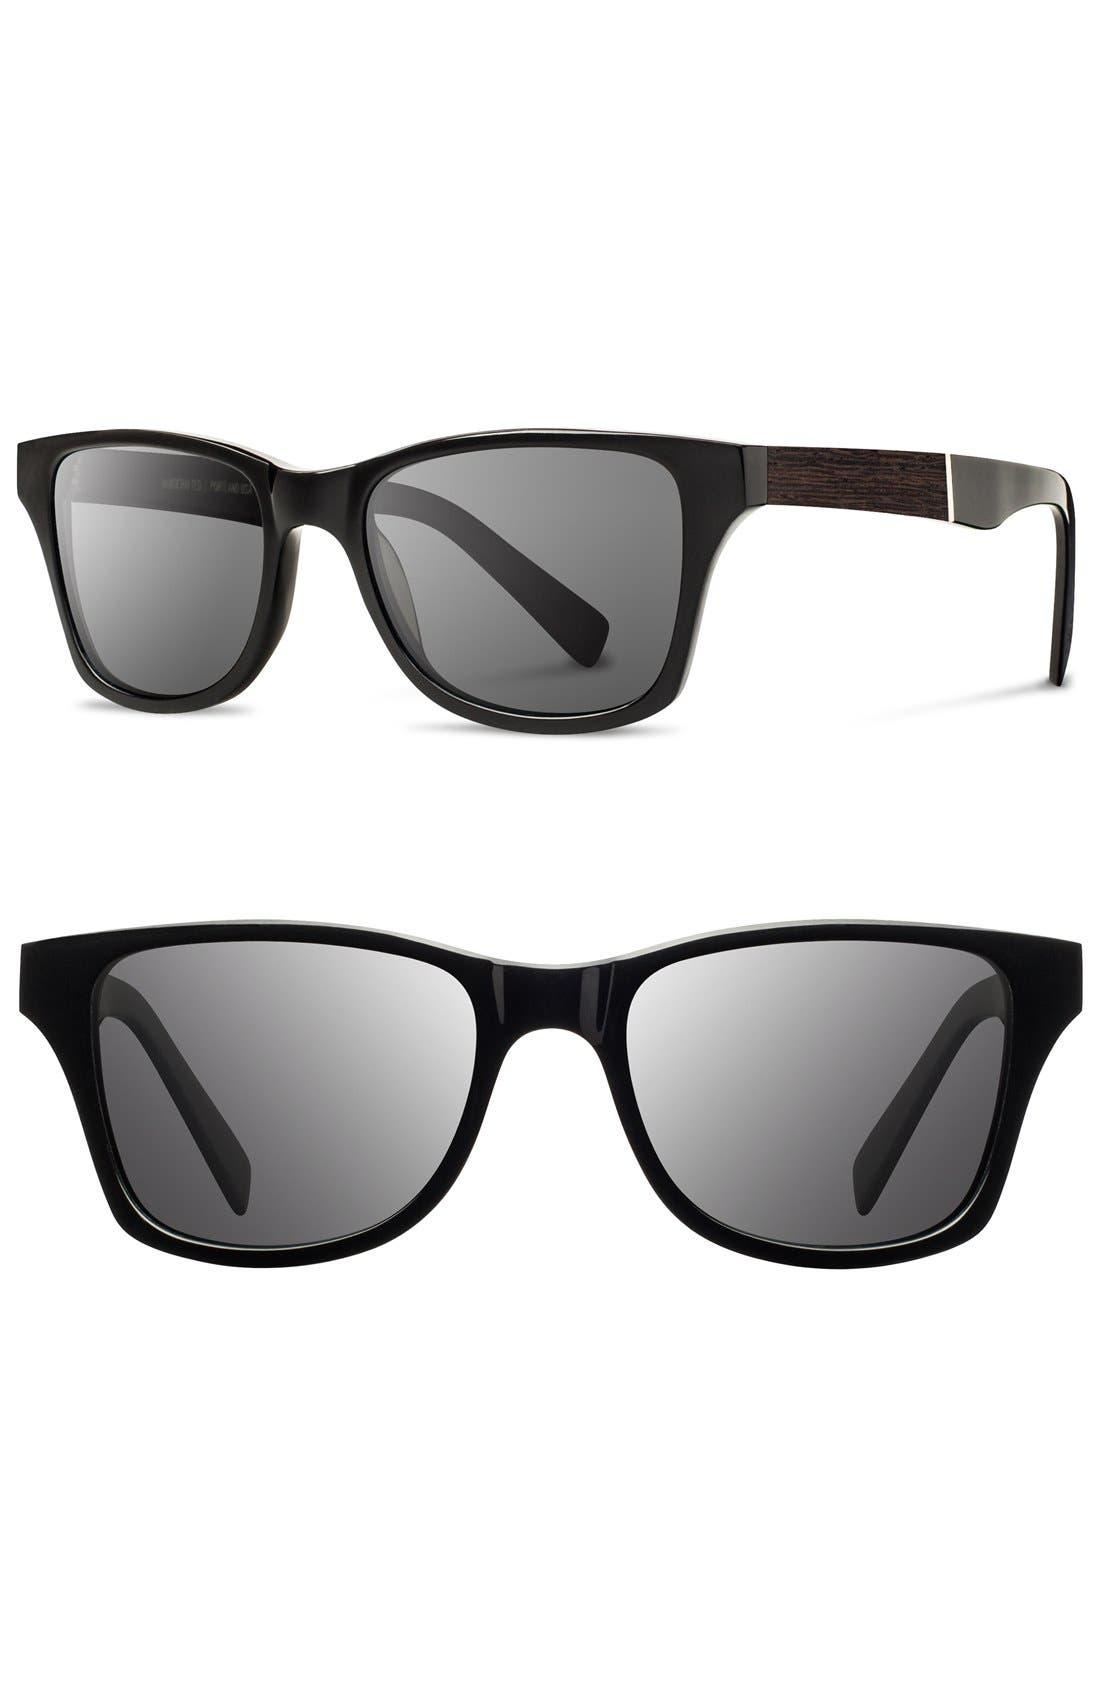 Alternate Image 1 Selected - Shwood 'Canby' 53mm Polarized Wood Sunglasses